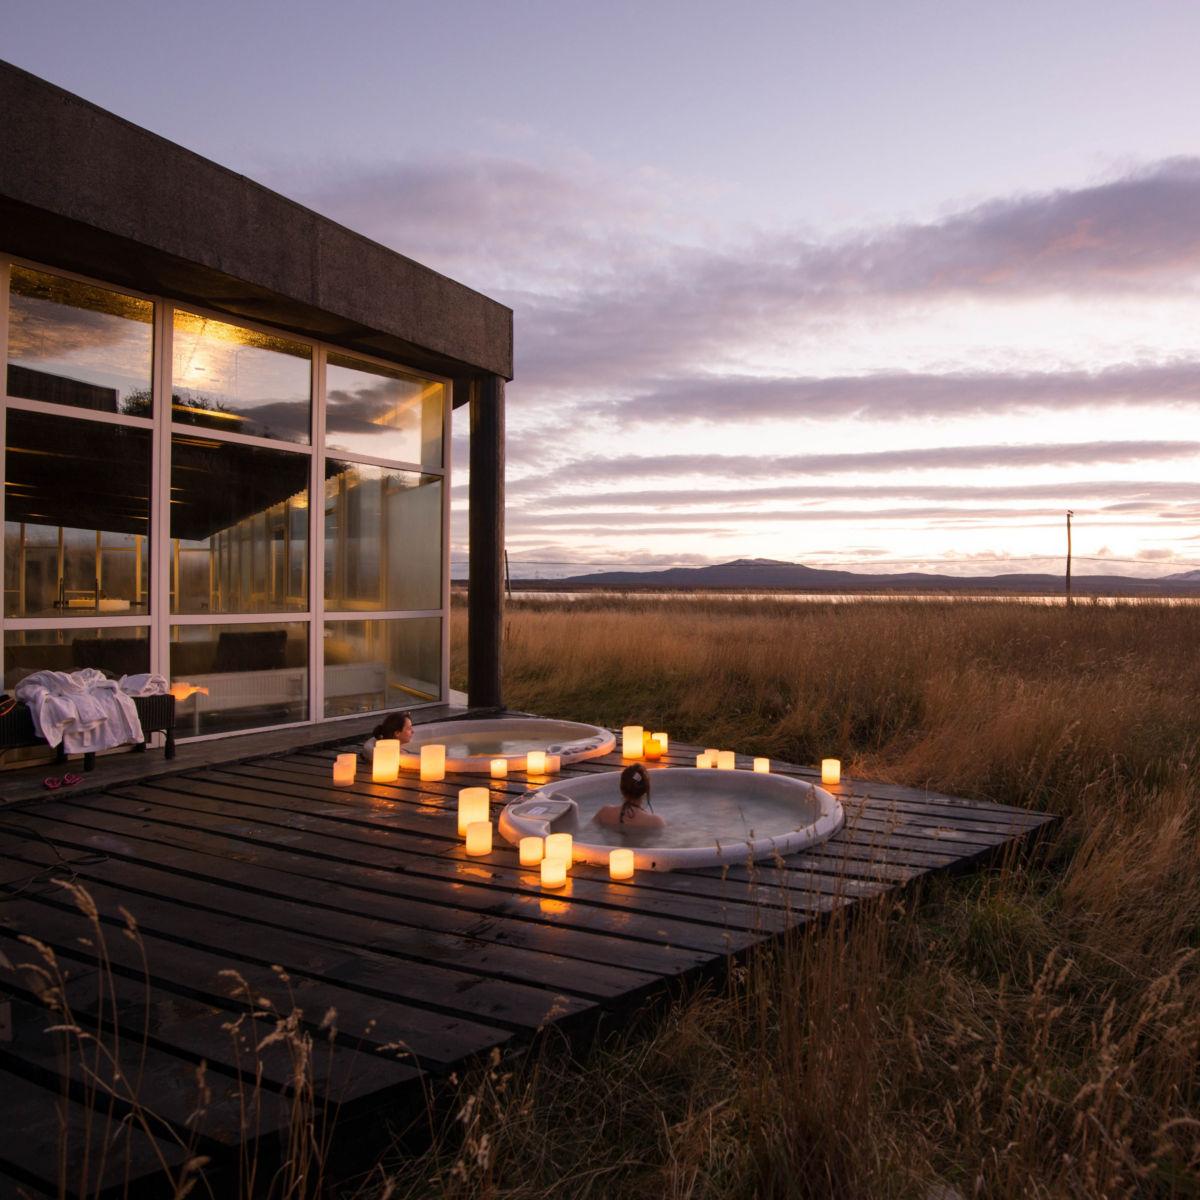 Remota Patagonia Lodge - image number 0